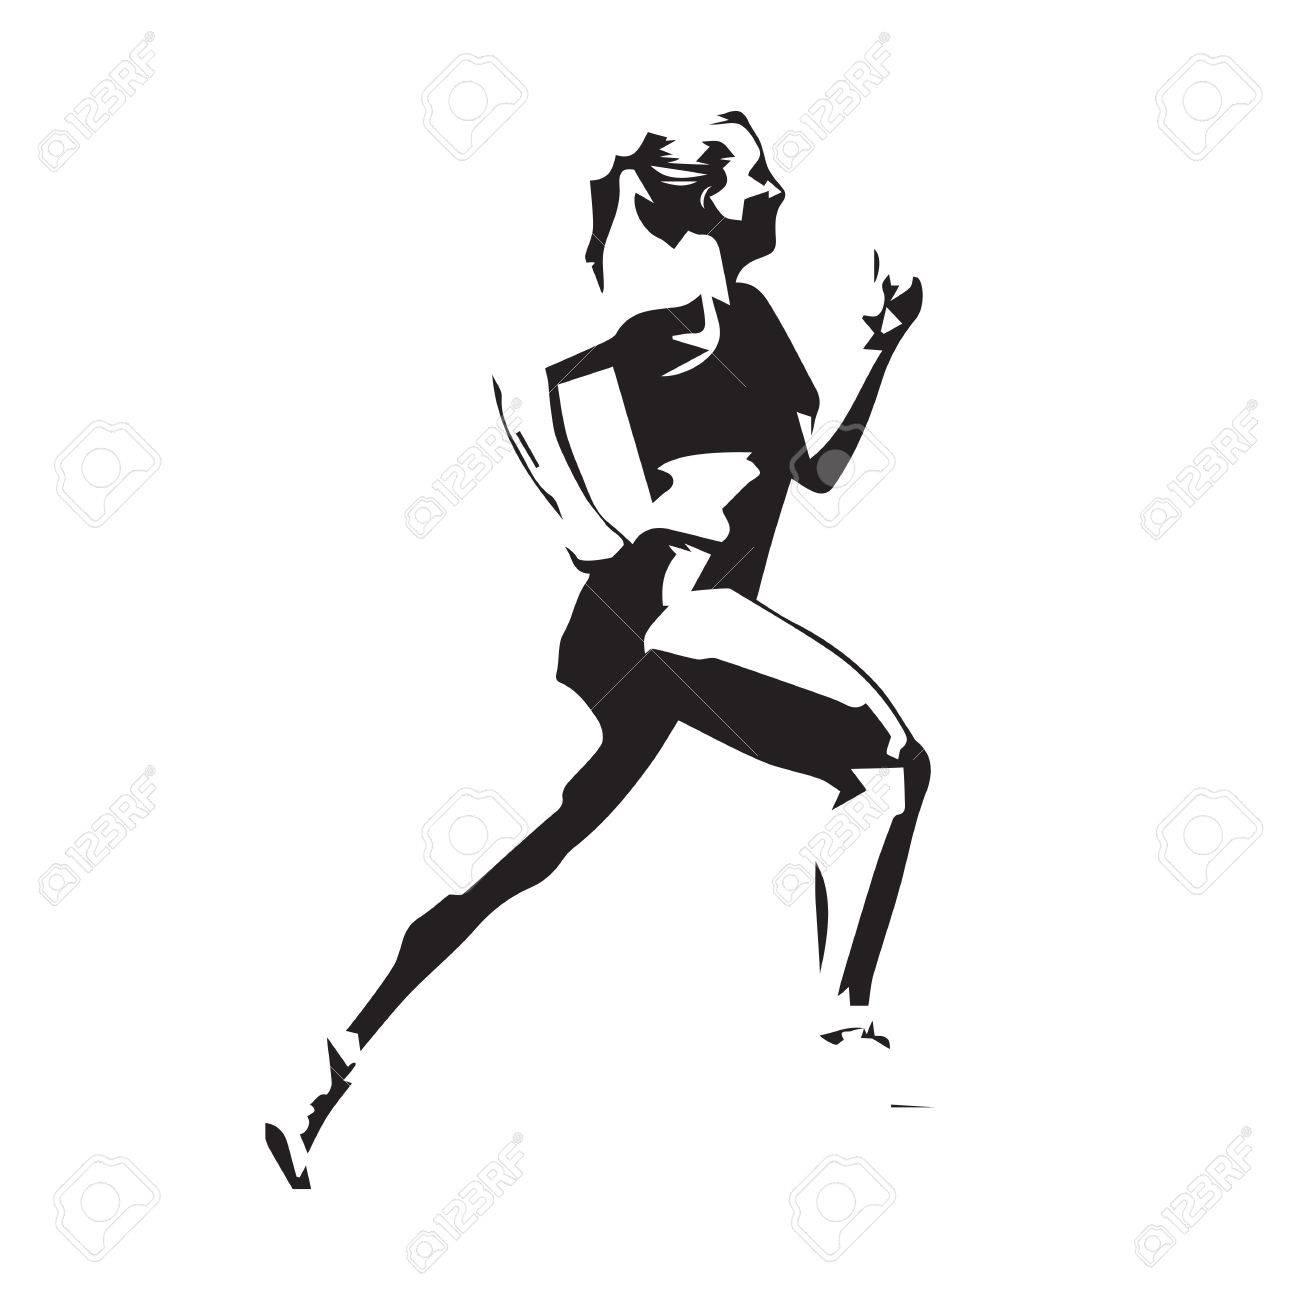 1300x1300 Running Woman Vector Illustration, Run Girl Silhouette Royalty